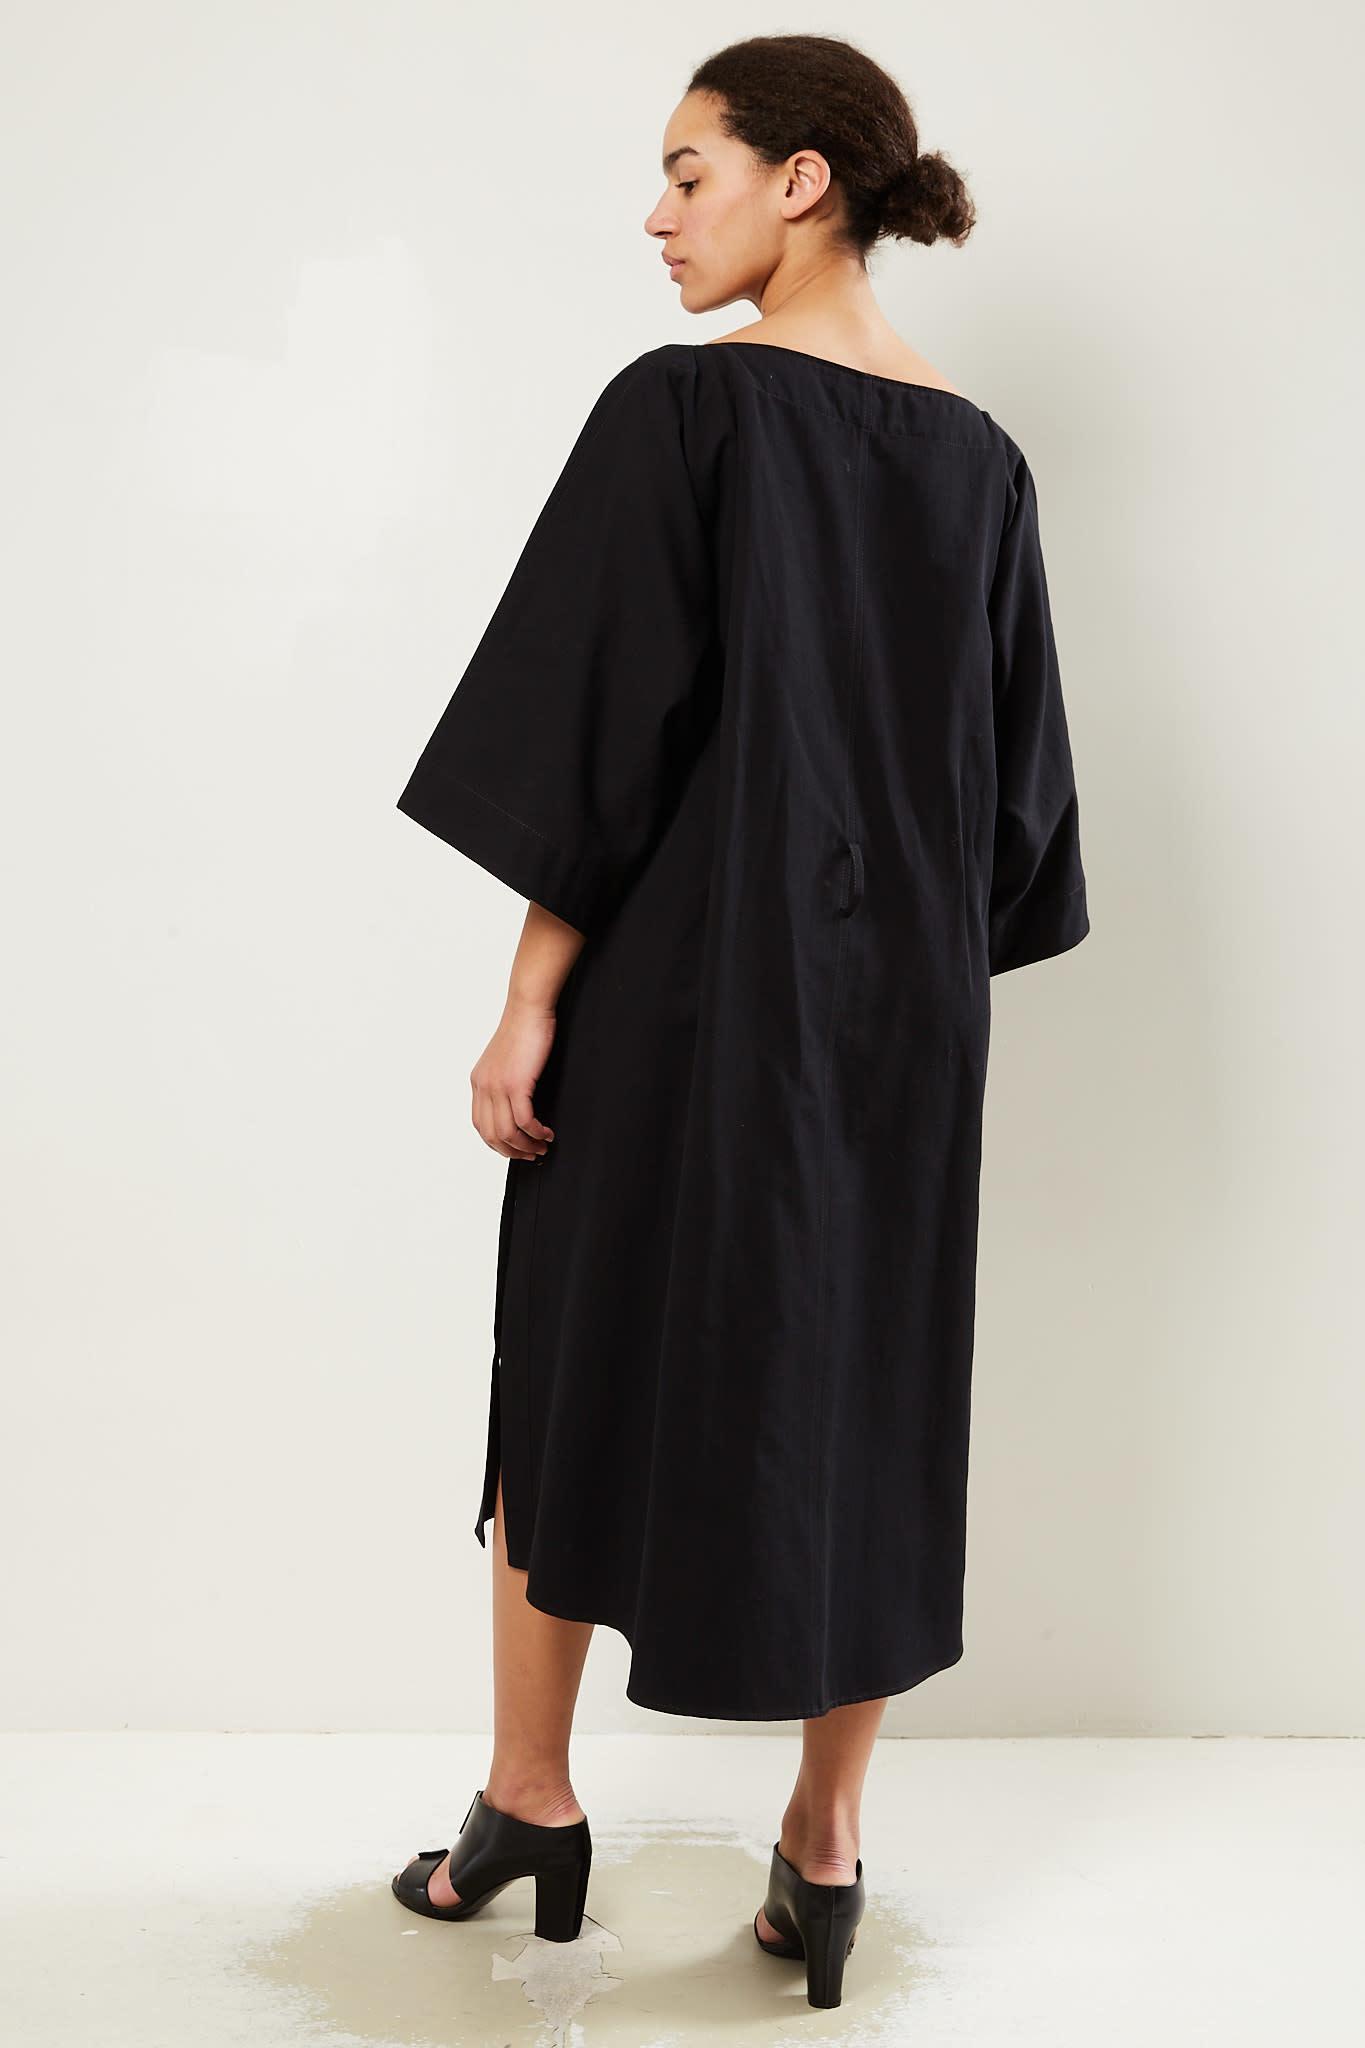 Lemaire - Vareuse dress